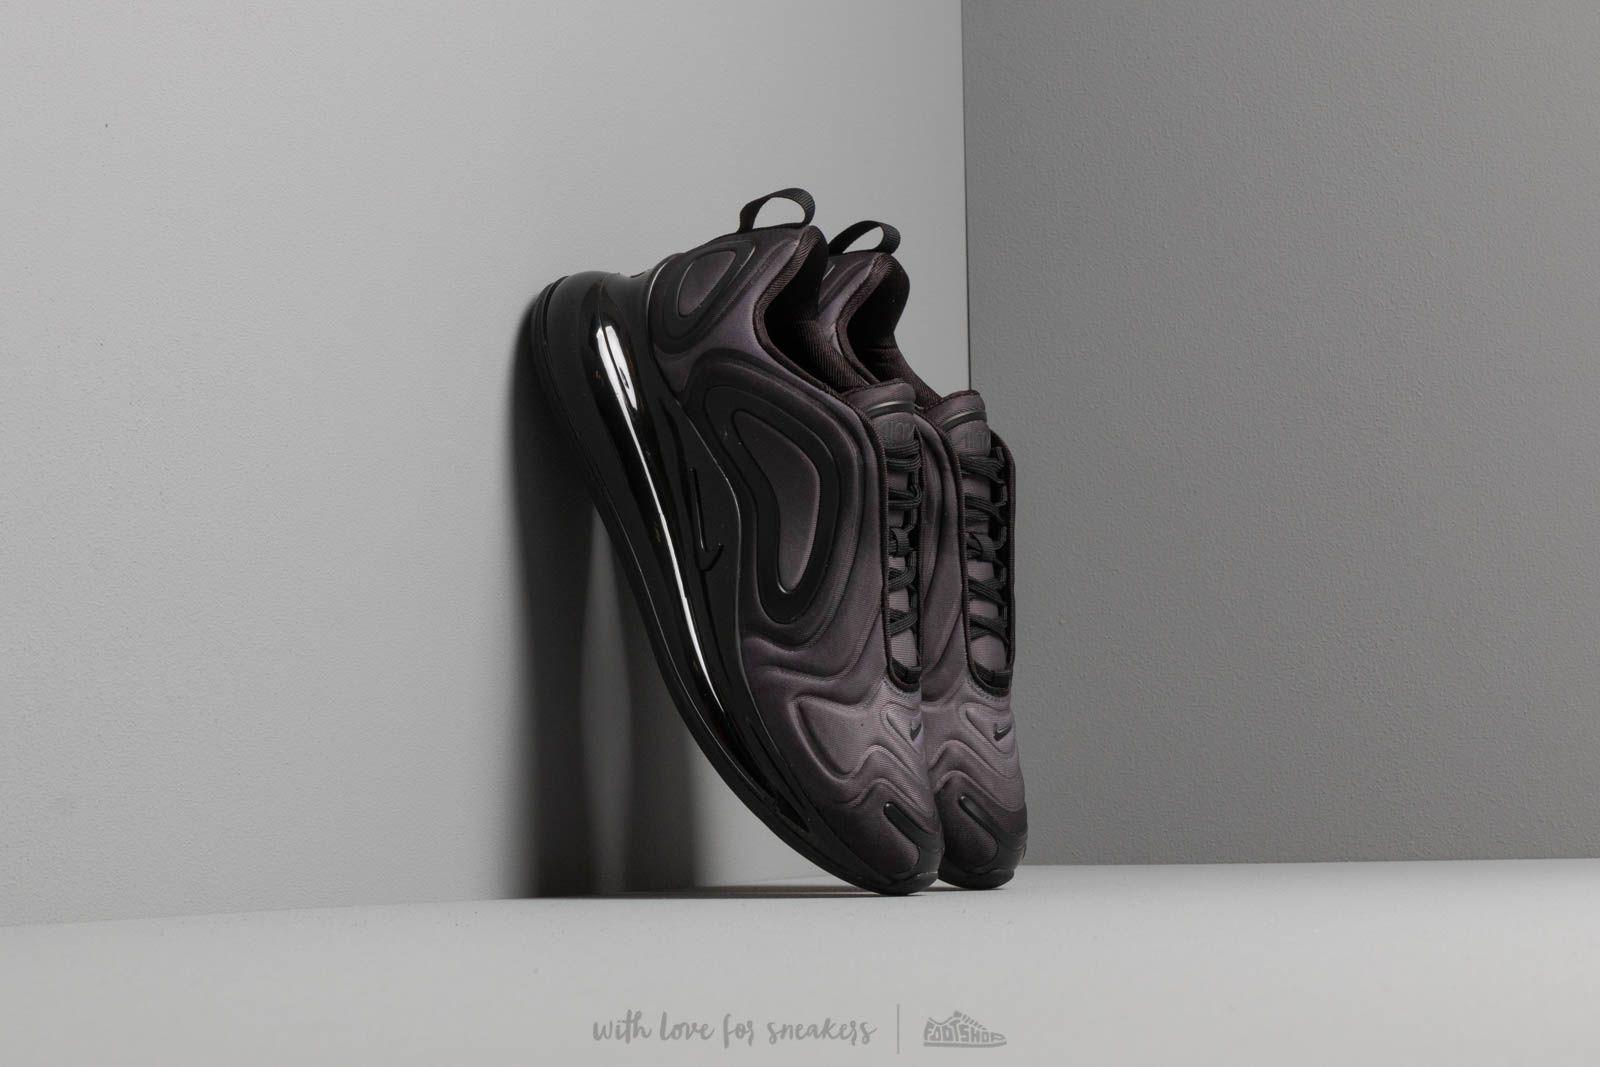 f14995fadb Nike Air Max 720 Black/ Black-Anthracite | Footshop